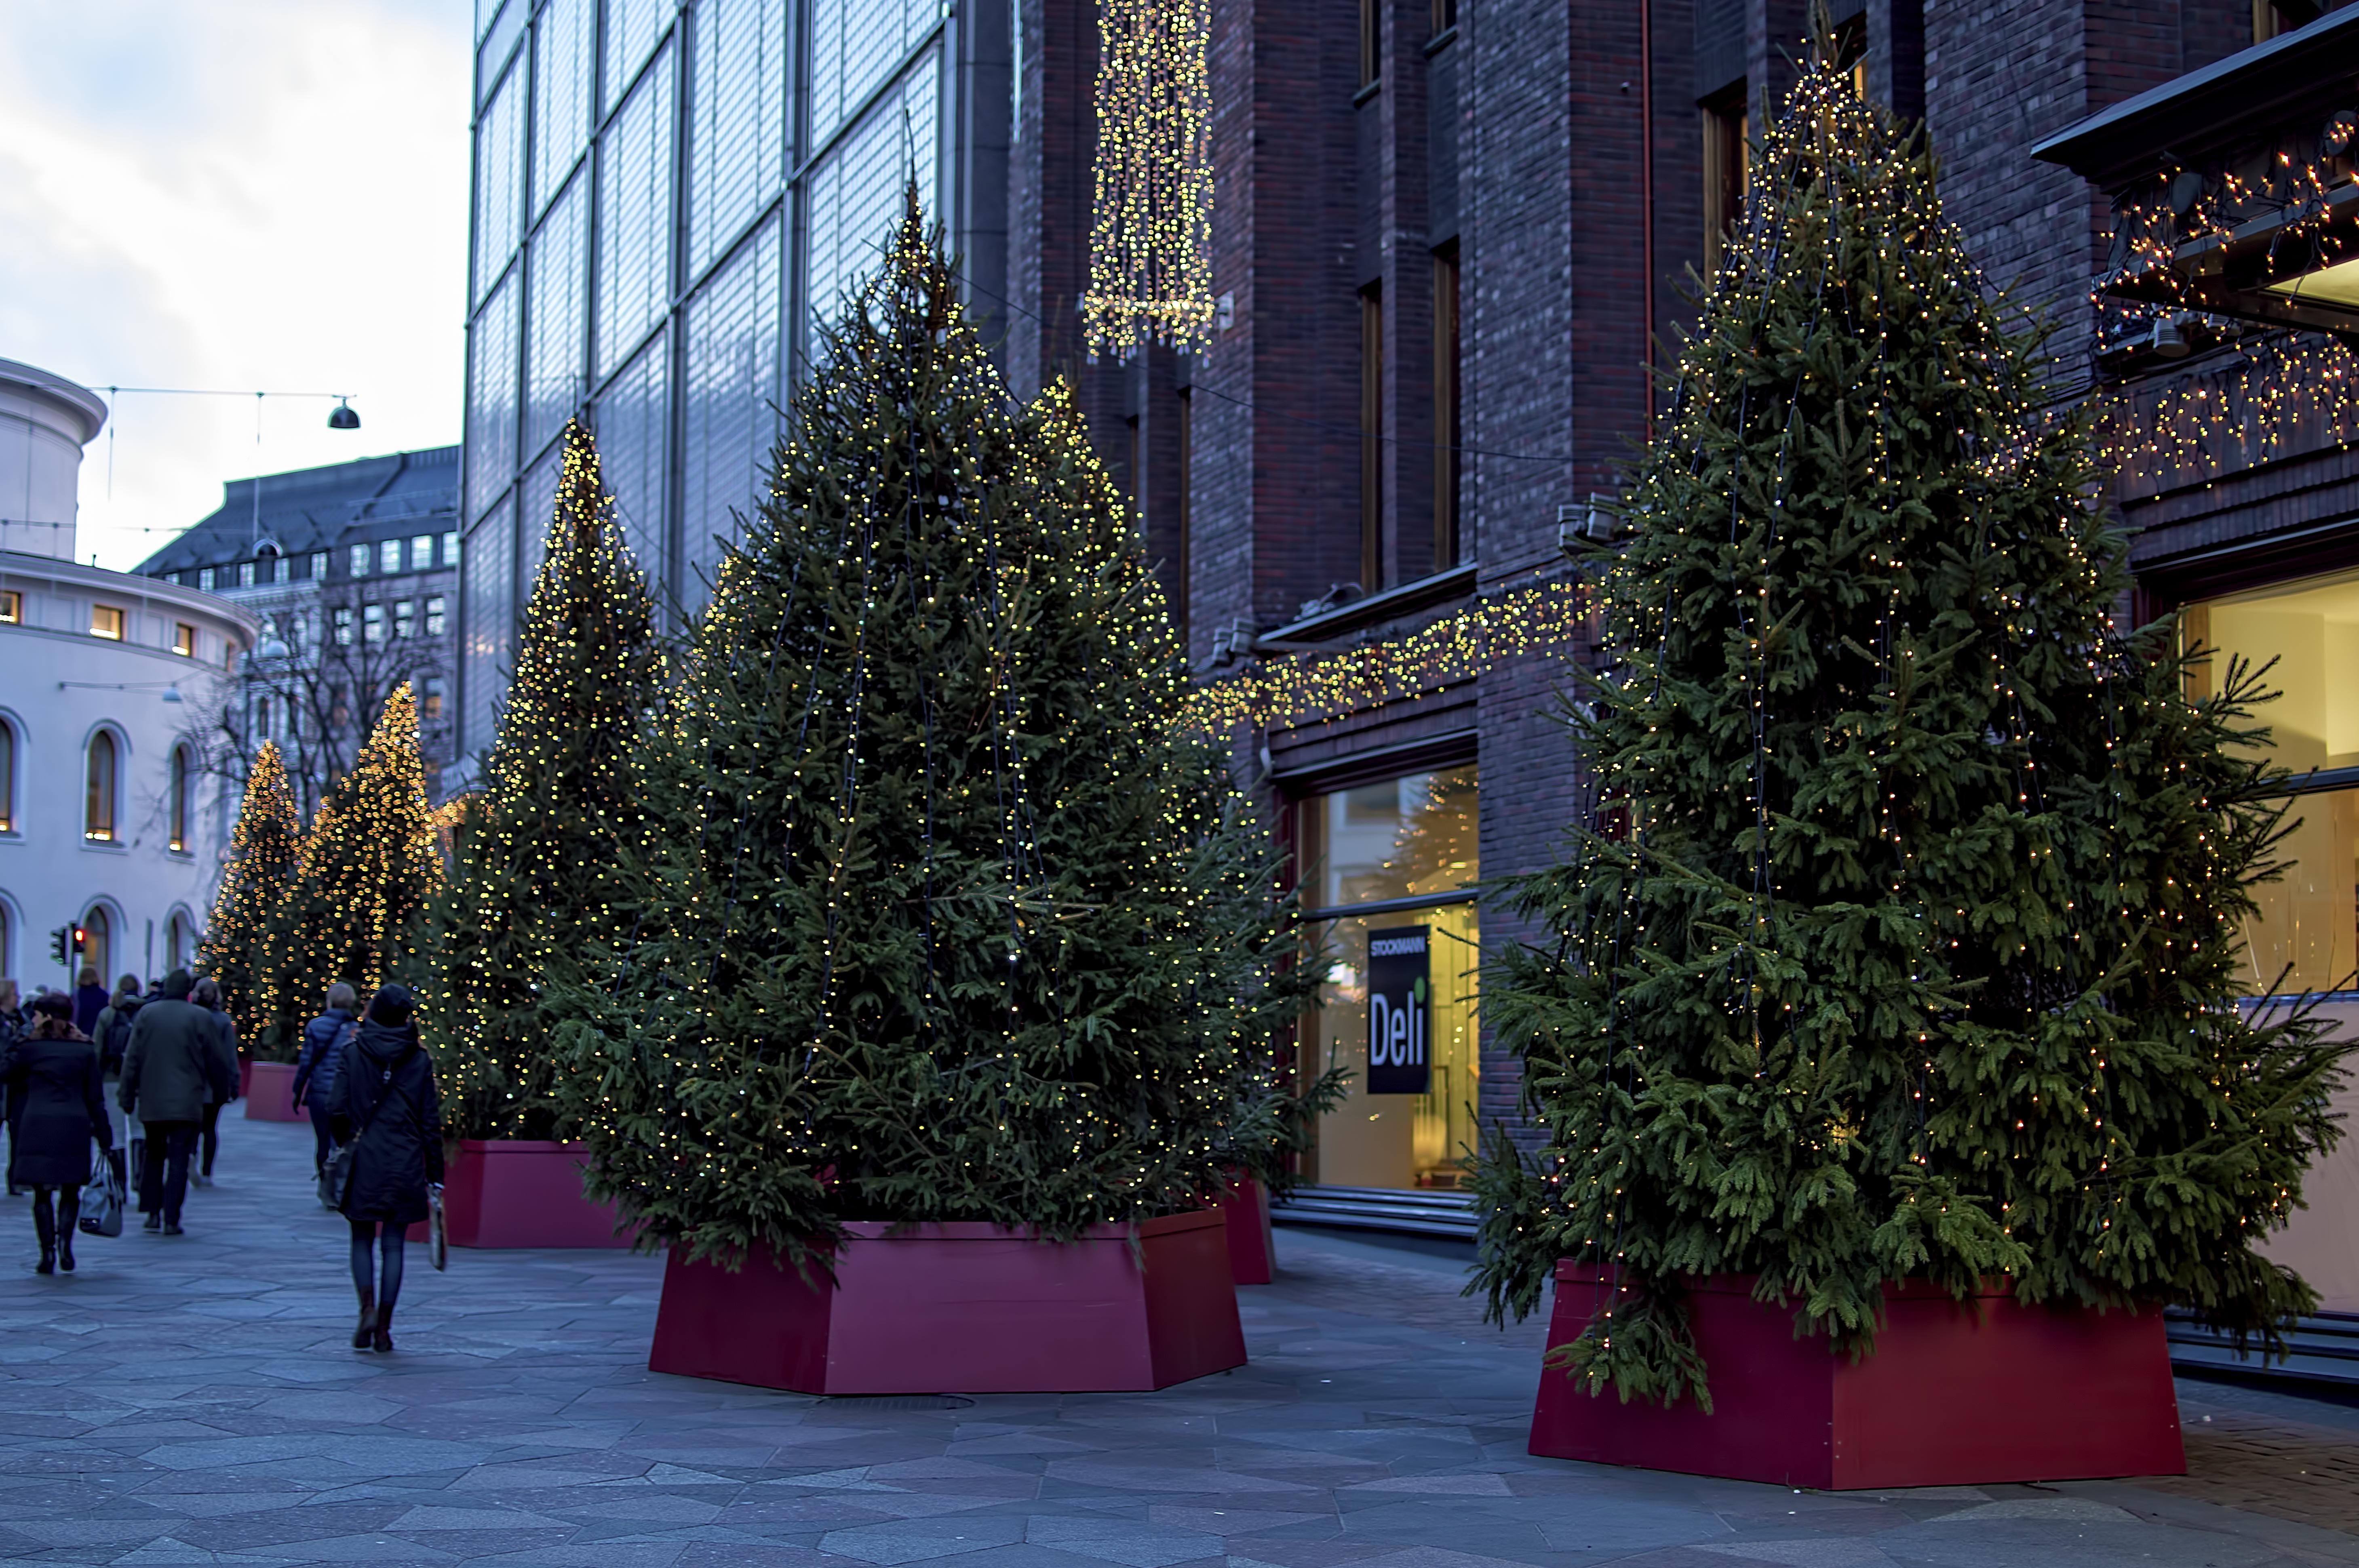 Finland Christmas Decorations.Free Images Store Christmas Season Festive Trees